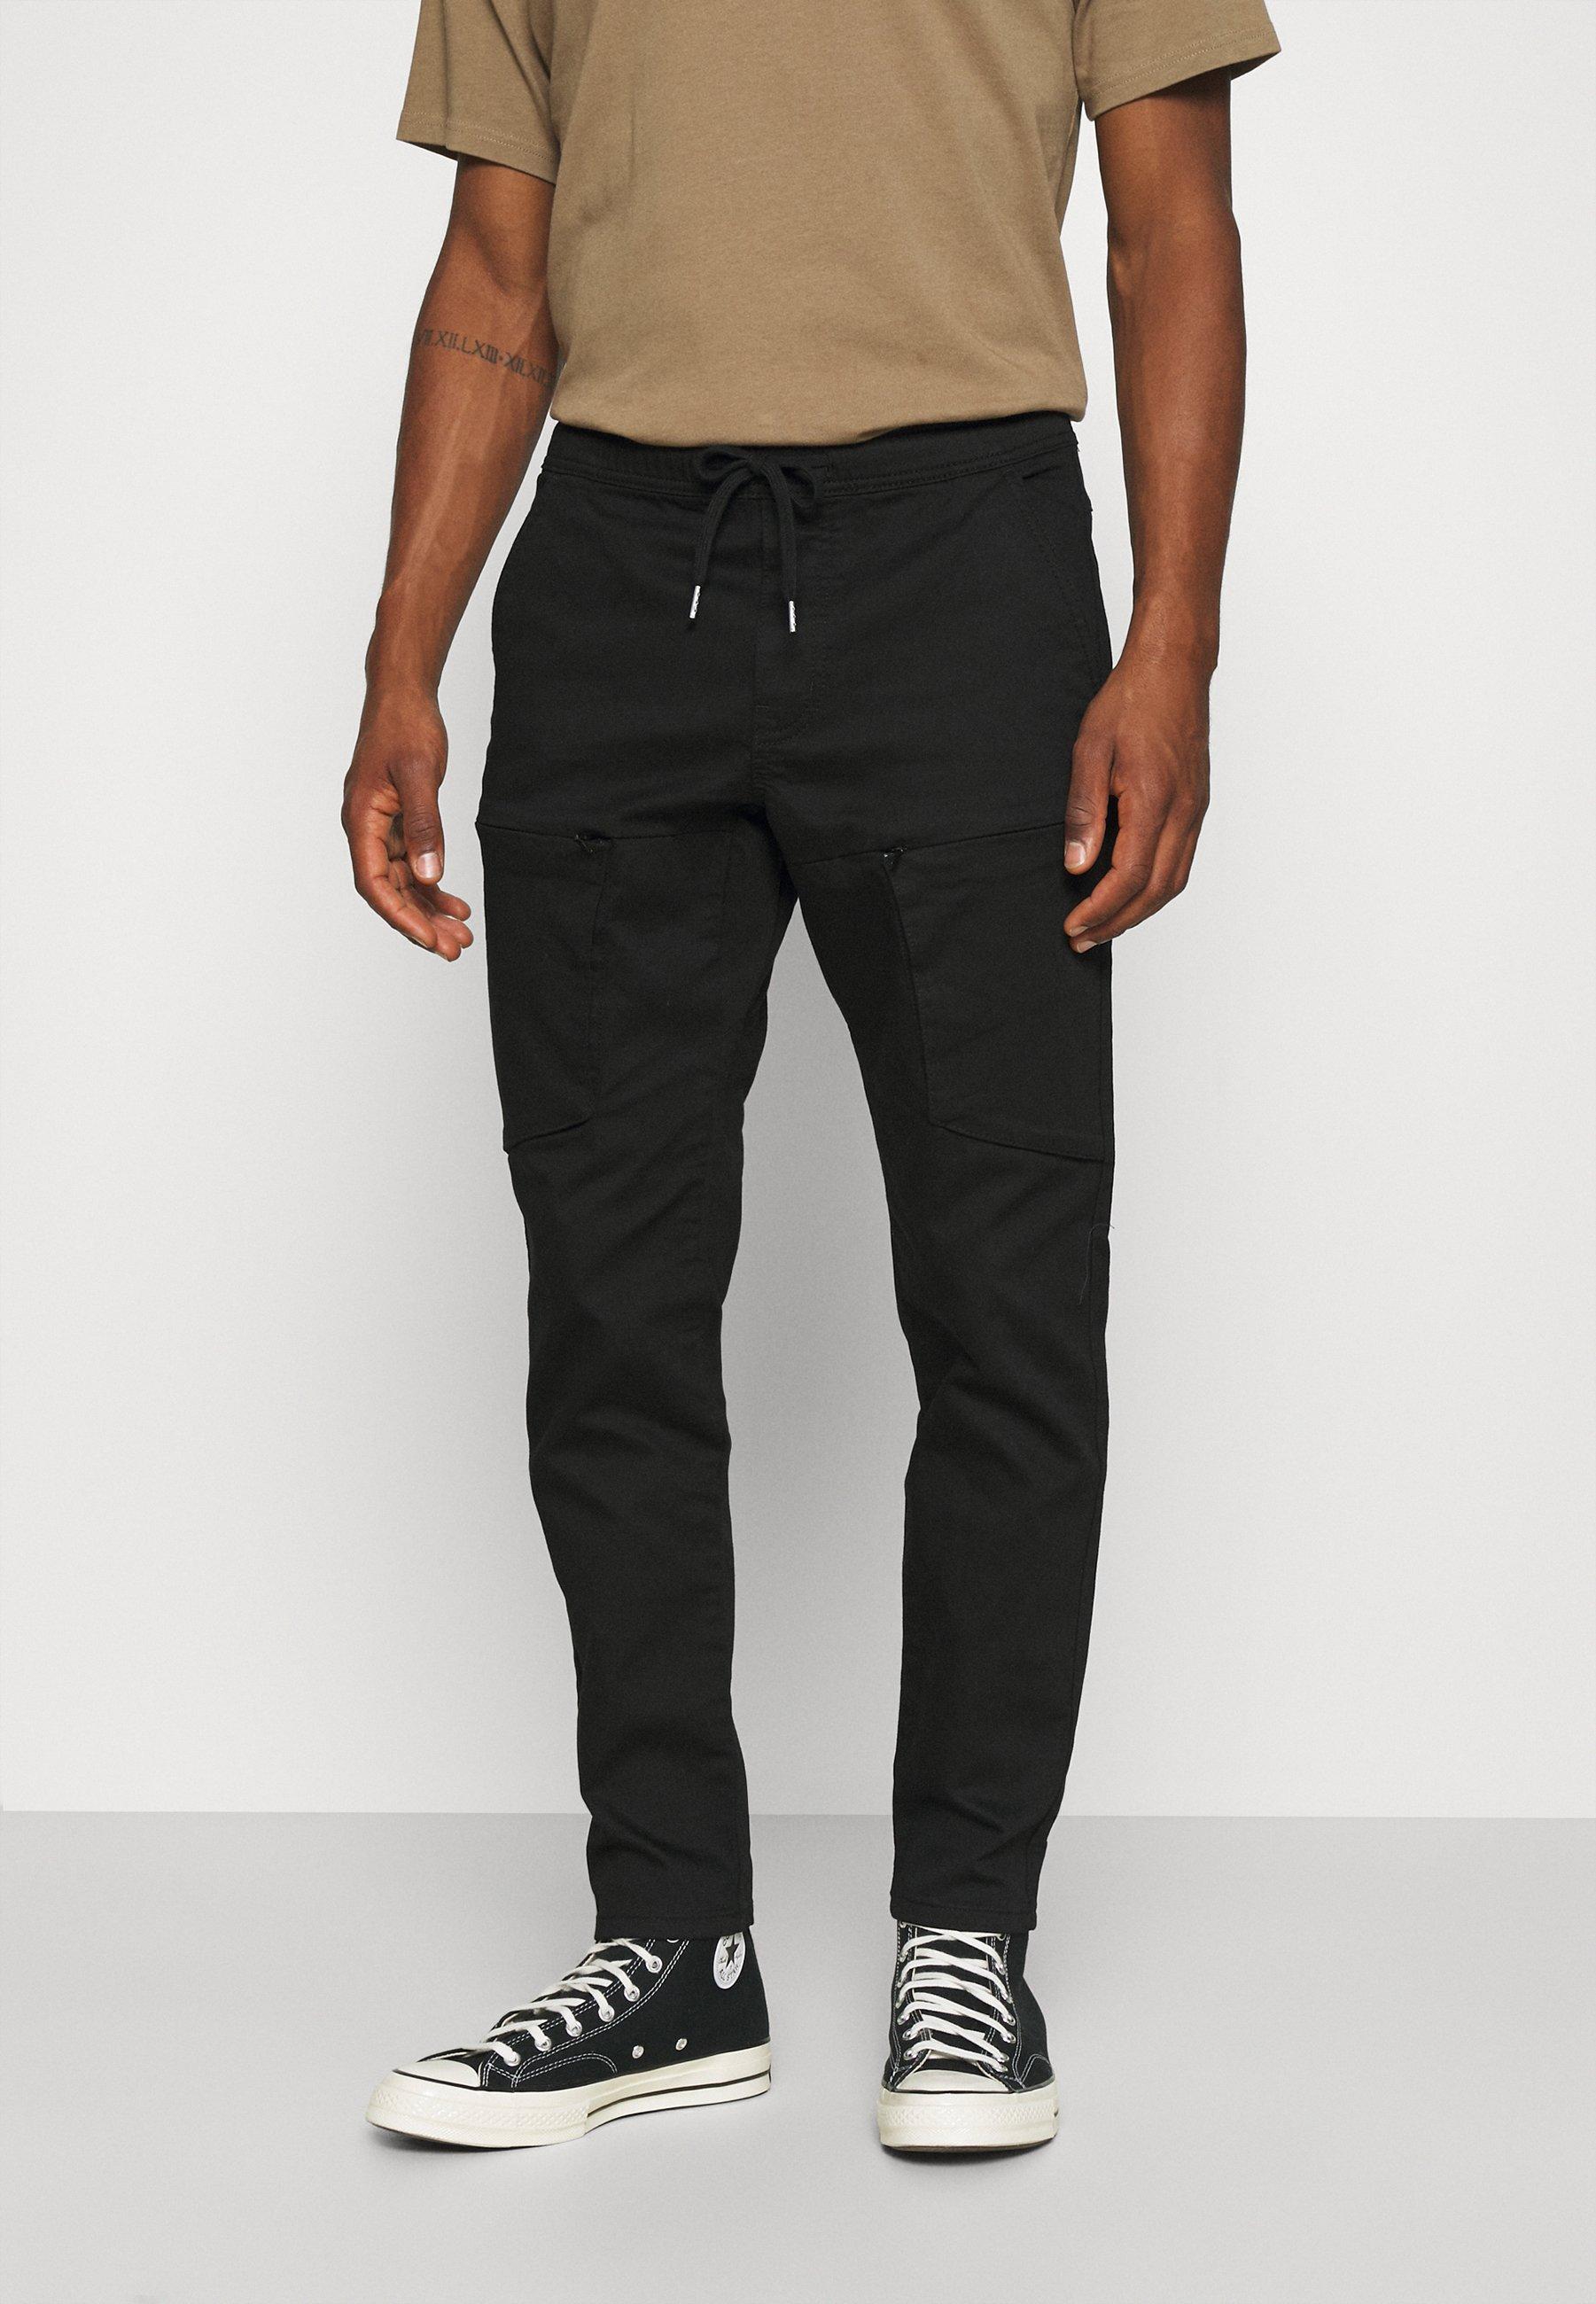 Homme RRFRED PANTS - Pantalon cargo